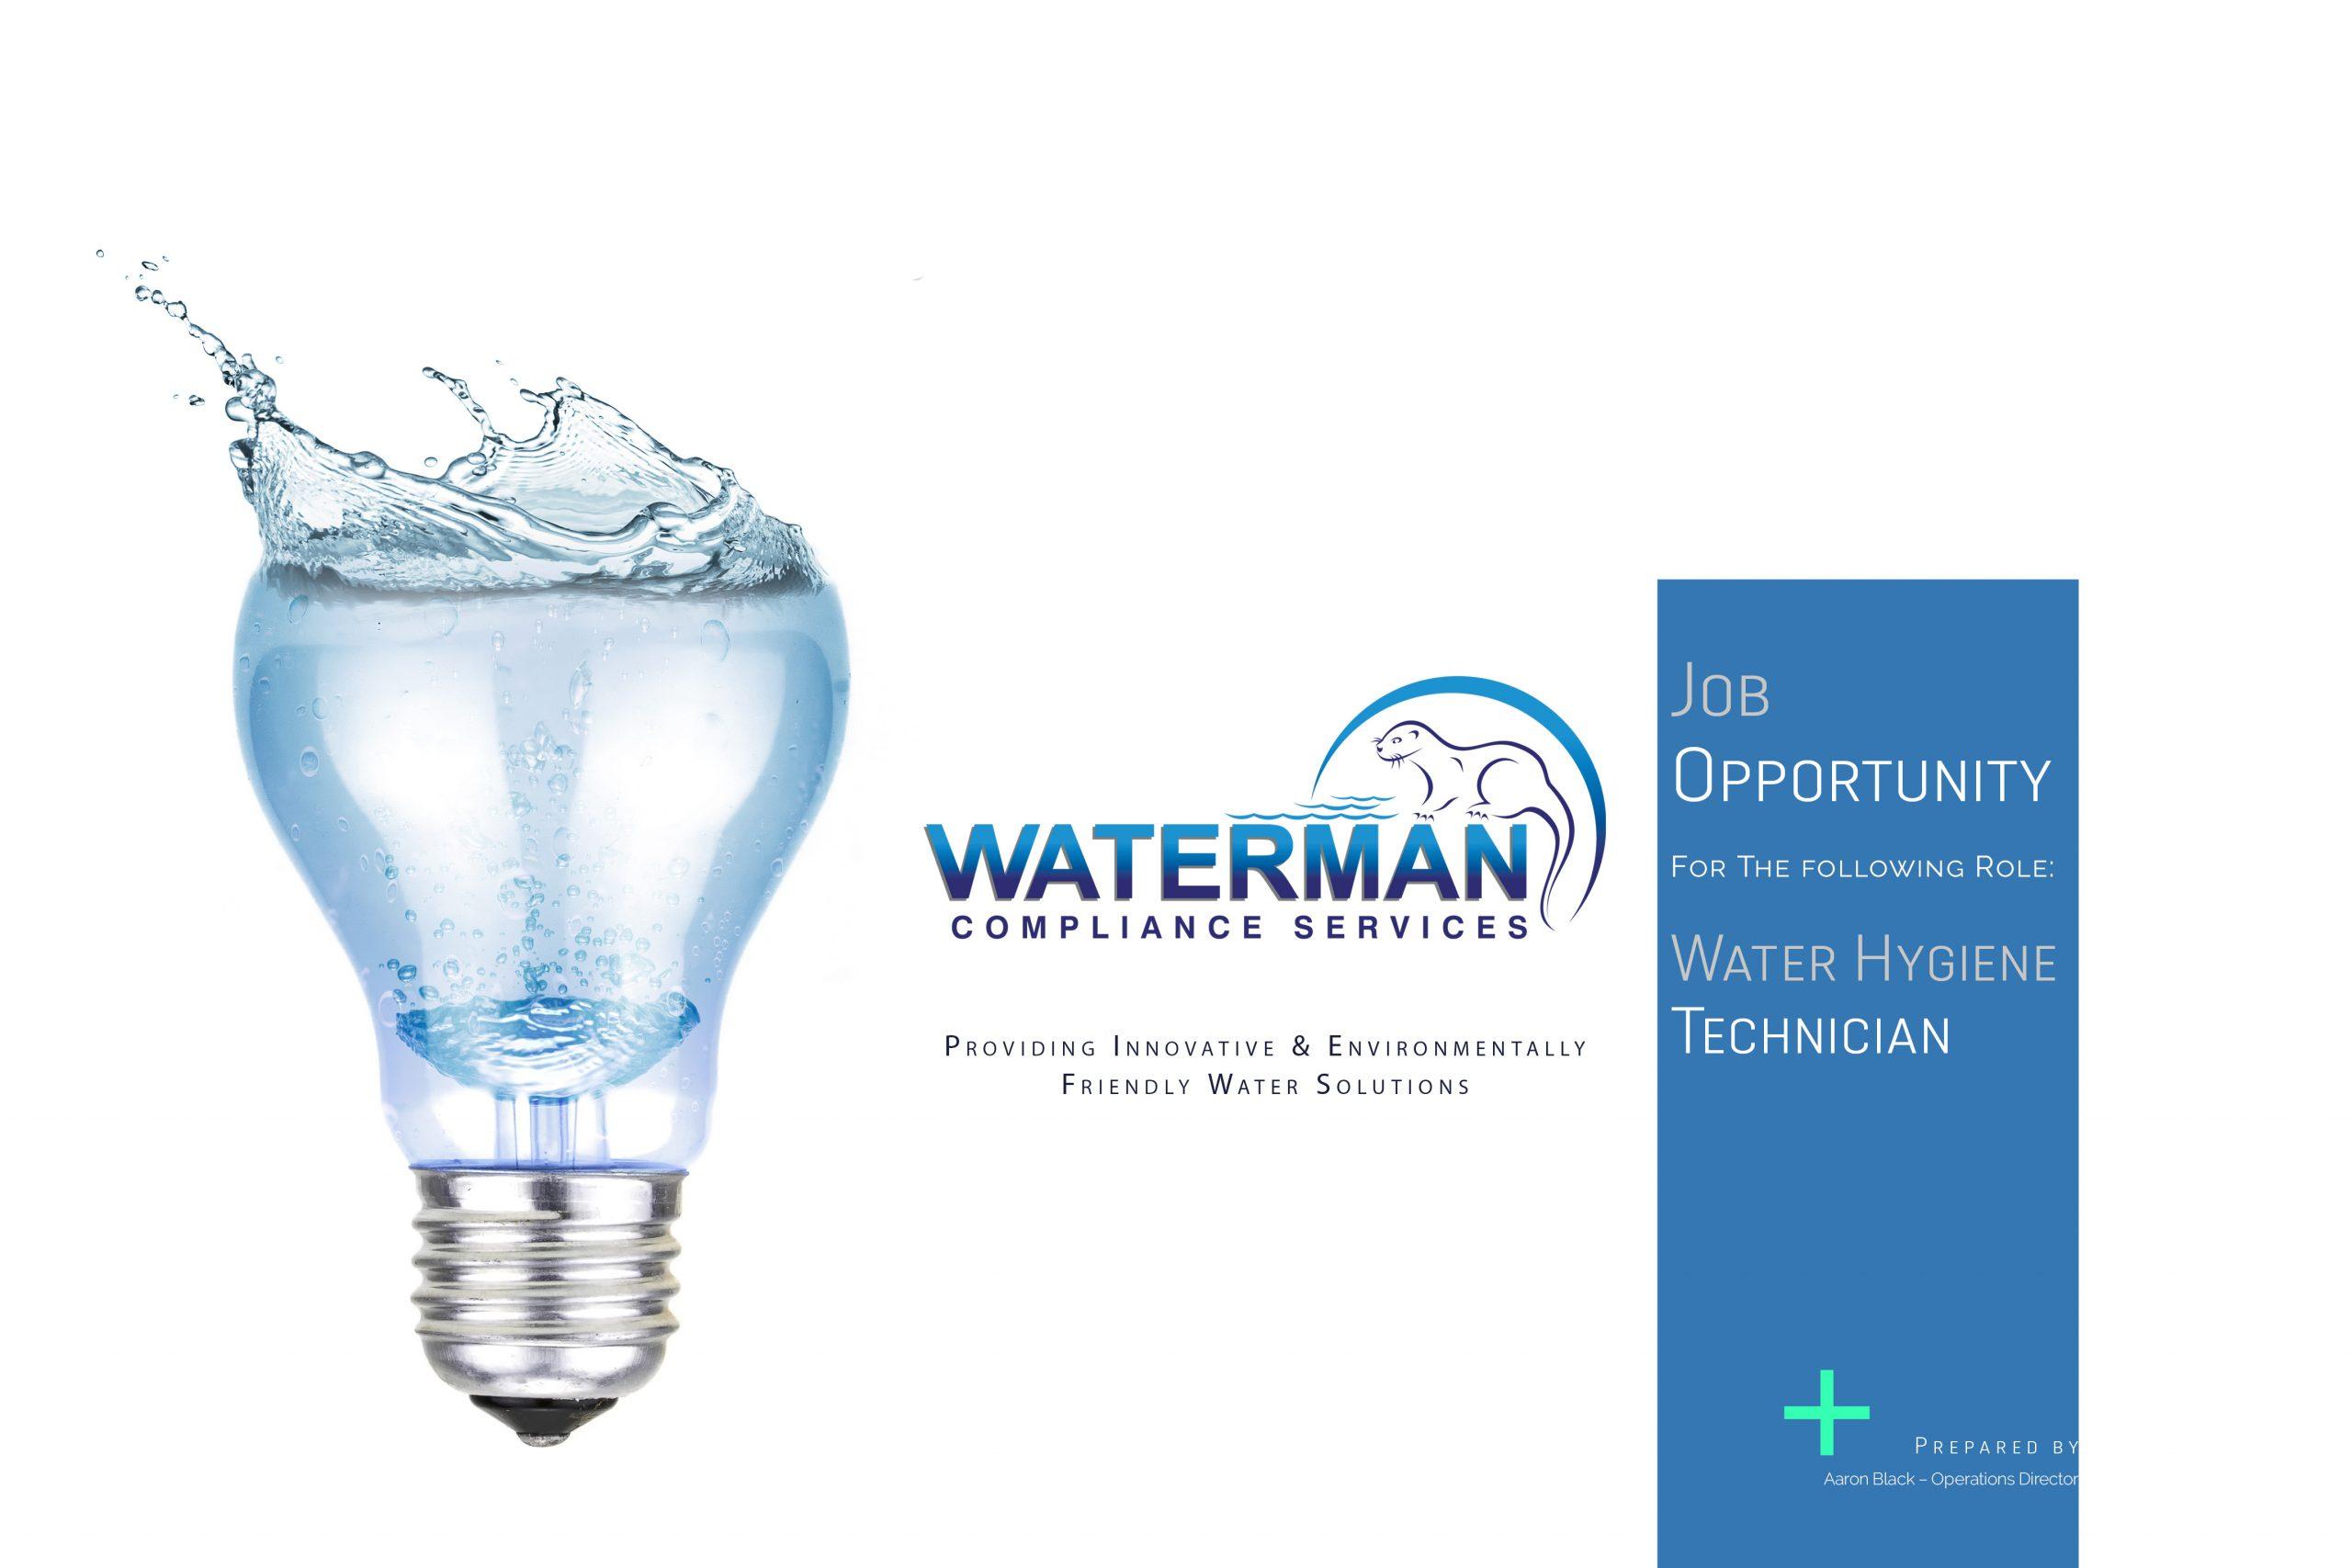 20200605 - Waterman Compliance Services Job Post - Water Hygiene Technician